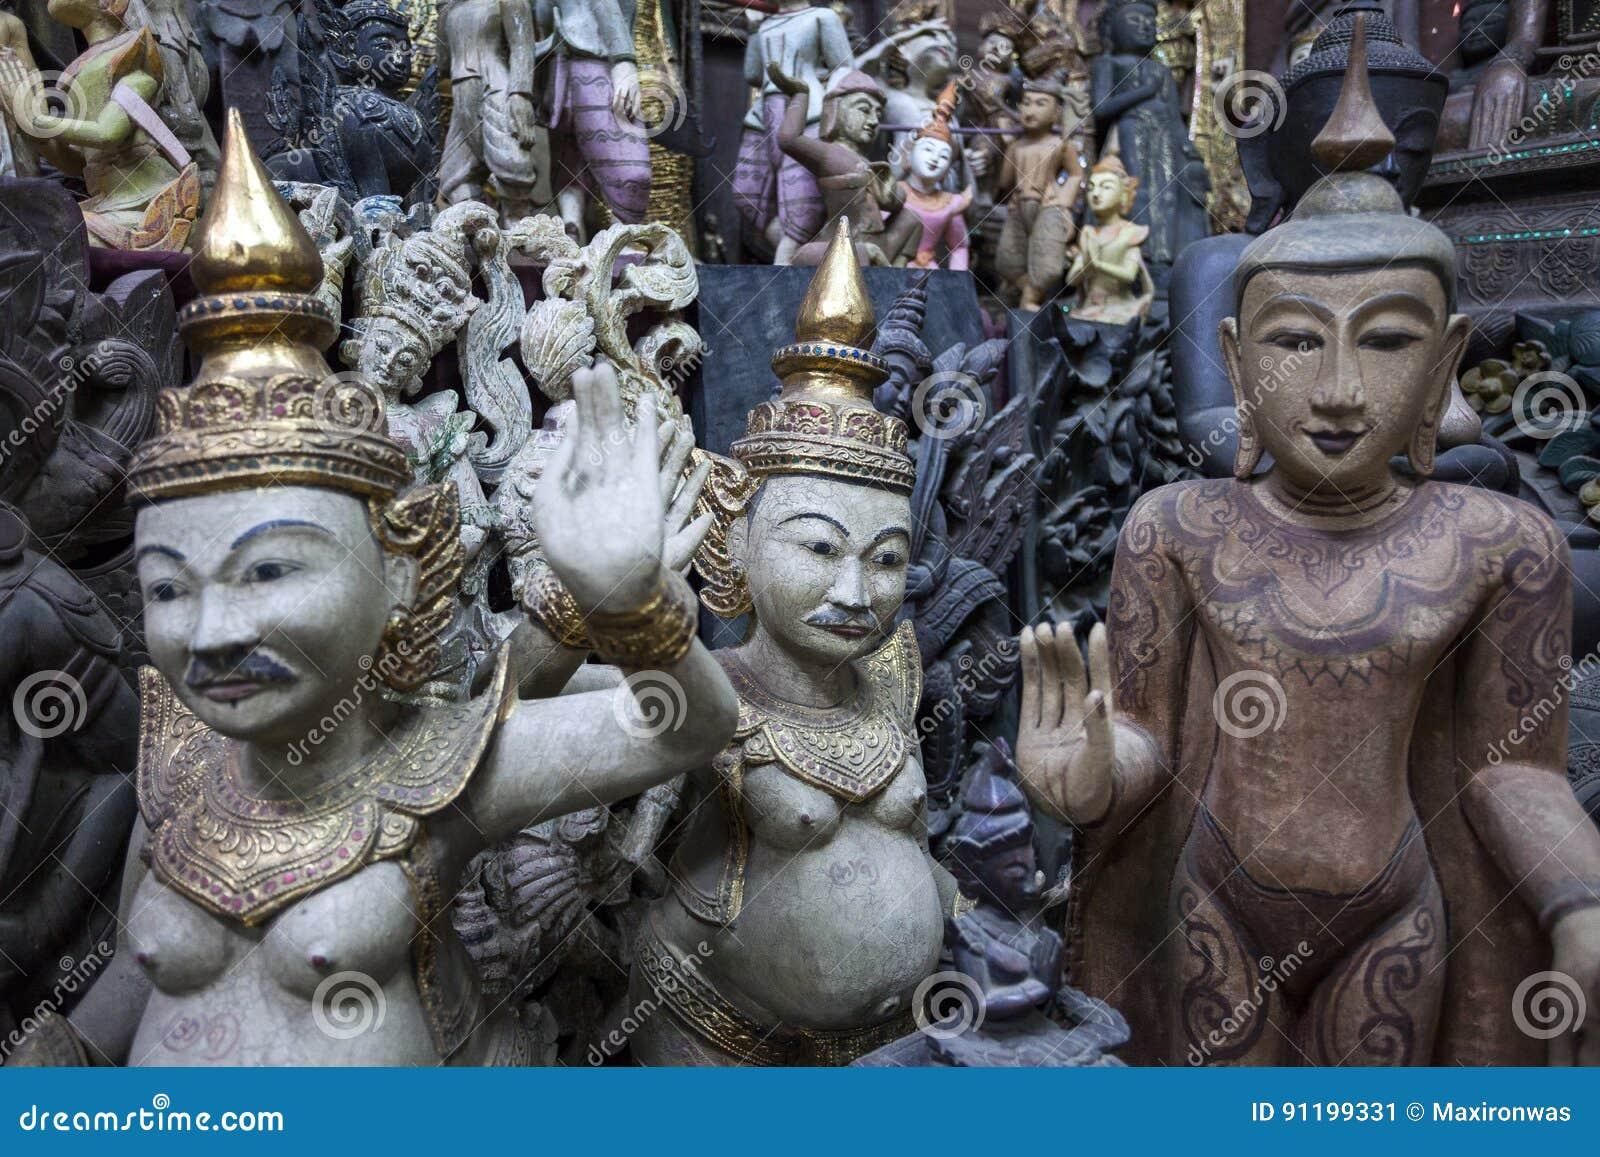 Mandalay - usine de marchandises